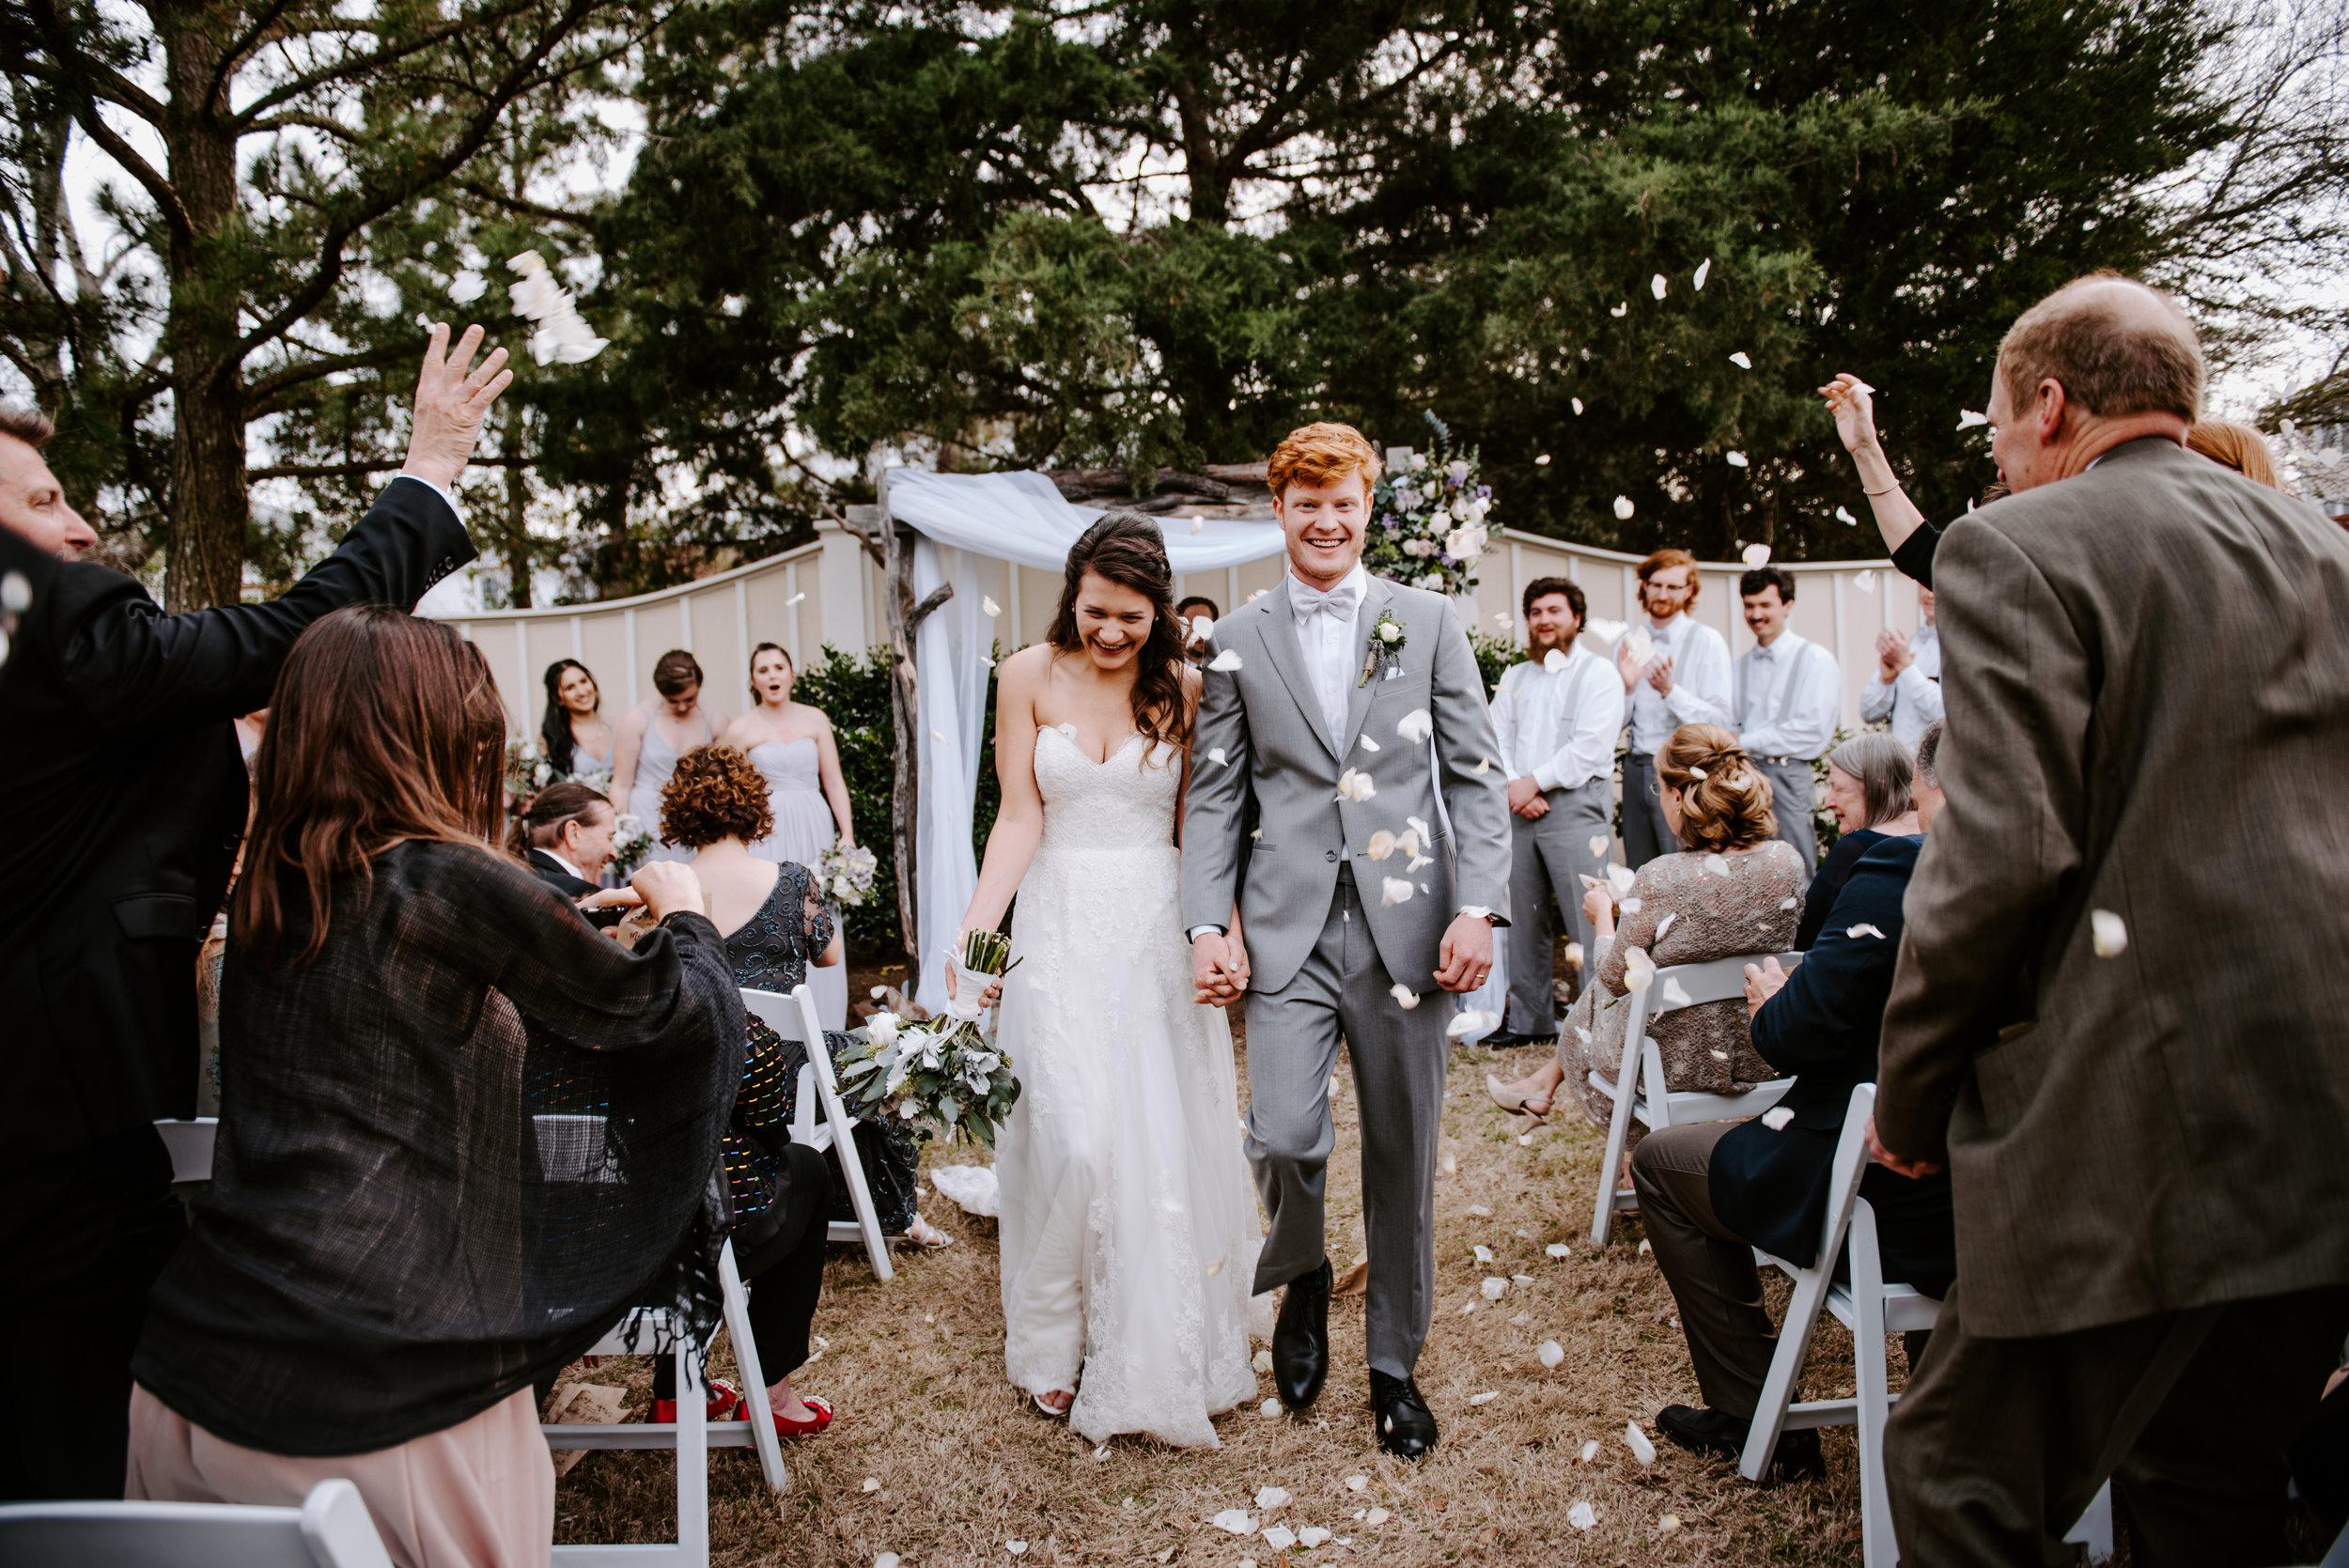 108 budleigh - Manteo wedding photographer - North Carolina wedding photographer - Raleigh wedding photographer - outer banks wedding photographer